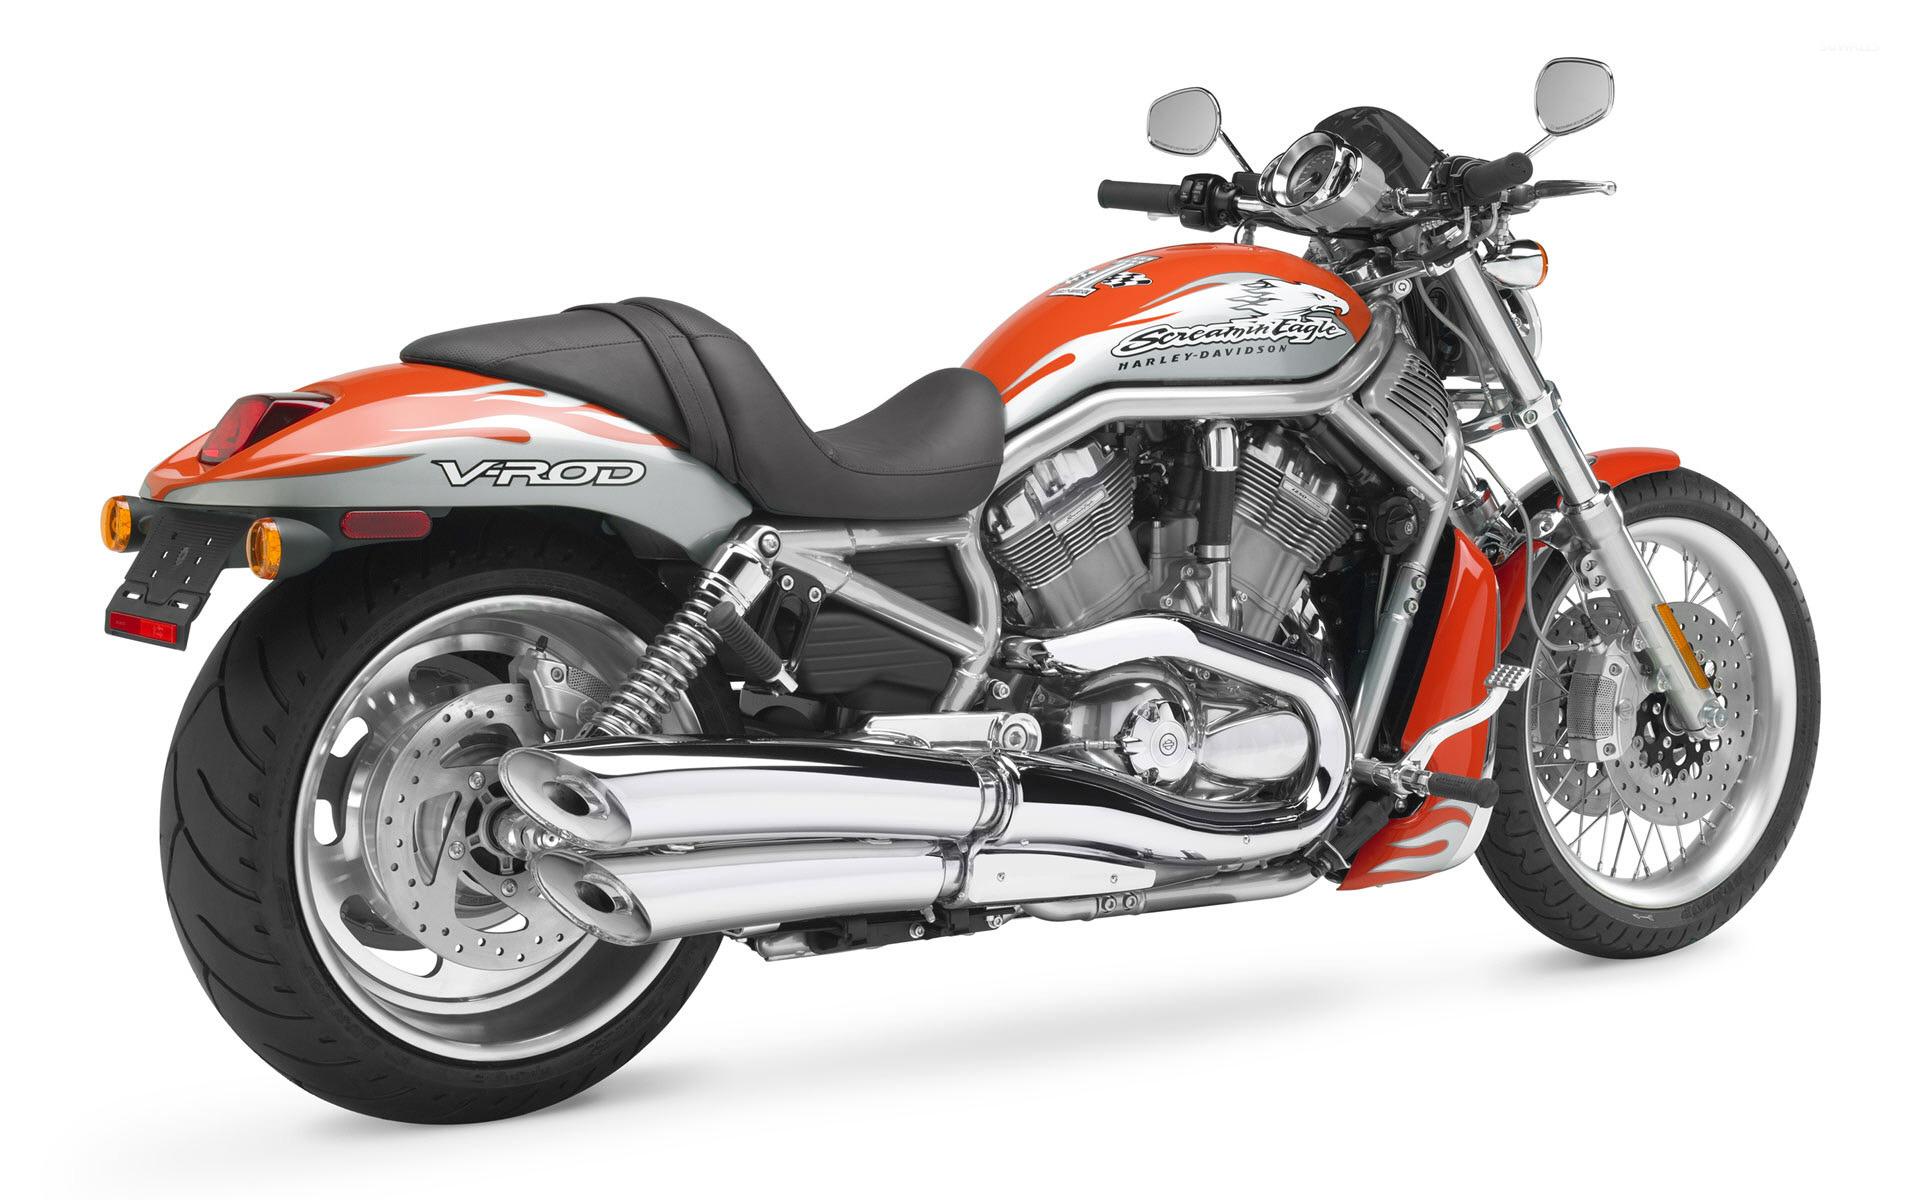 Davidson VRSCF V Rod Muscle wallpaper   Motorcycle wallpapers   9731 1280x800